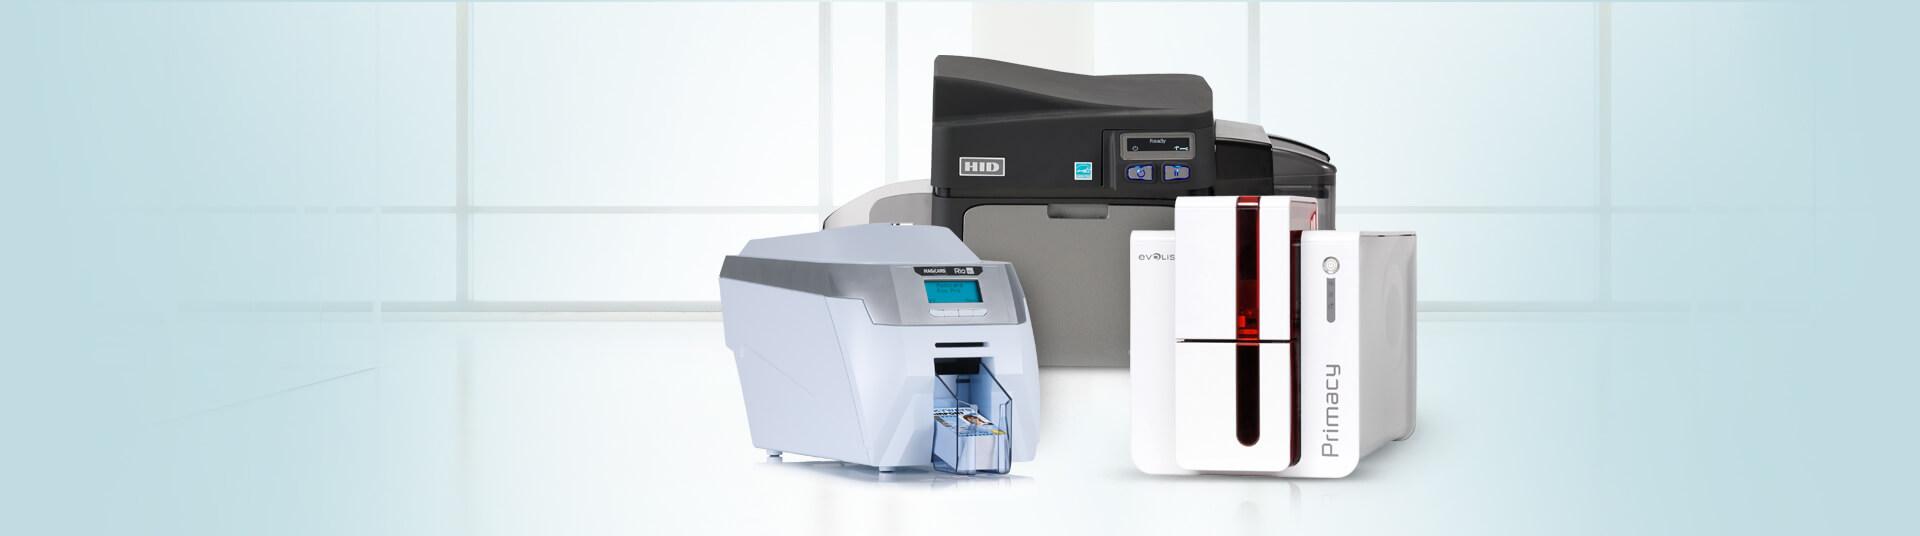 Photo ID Printers